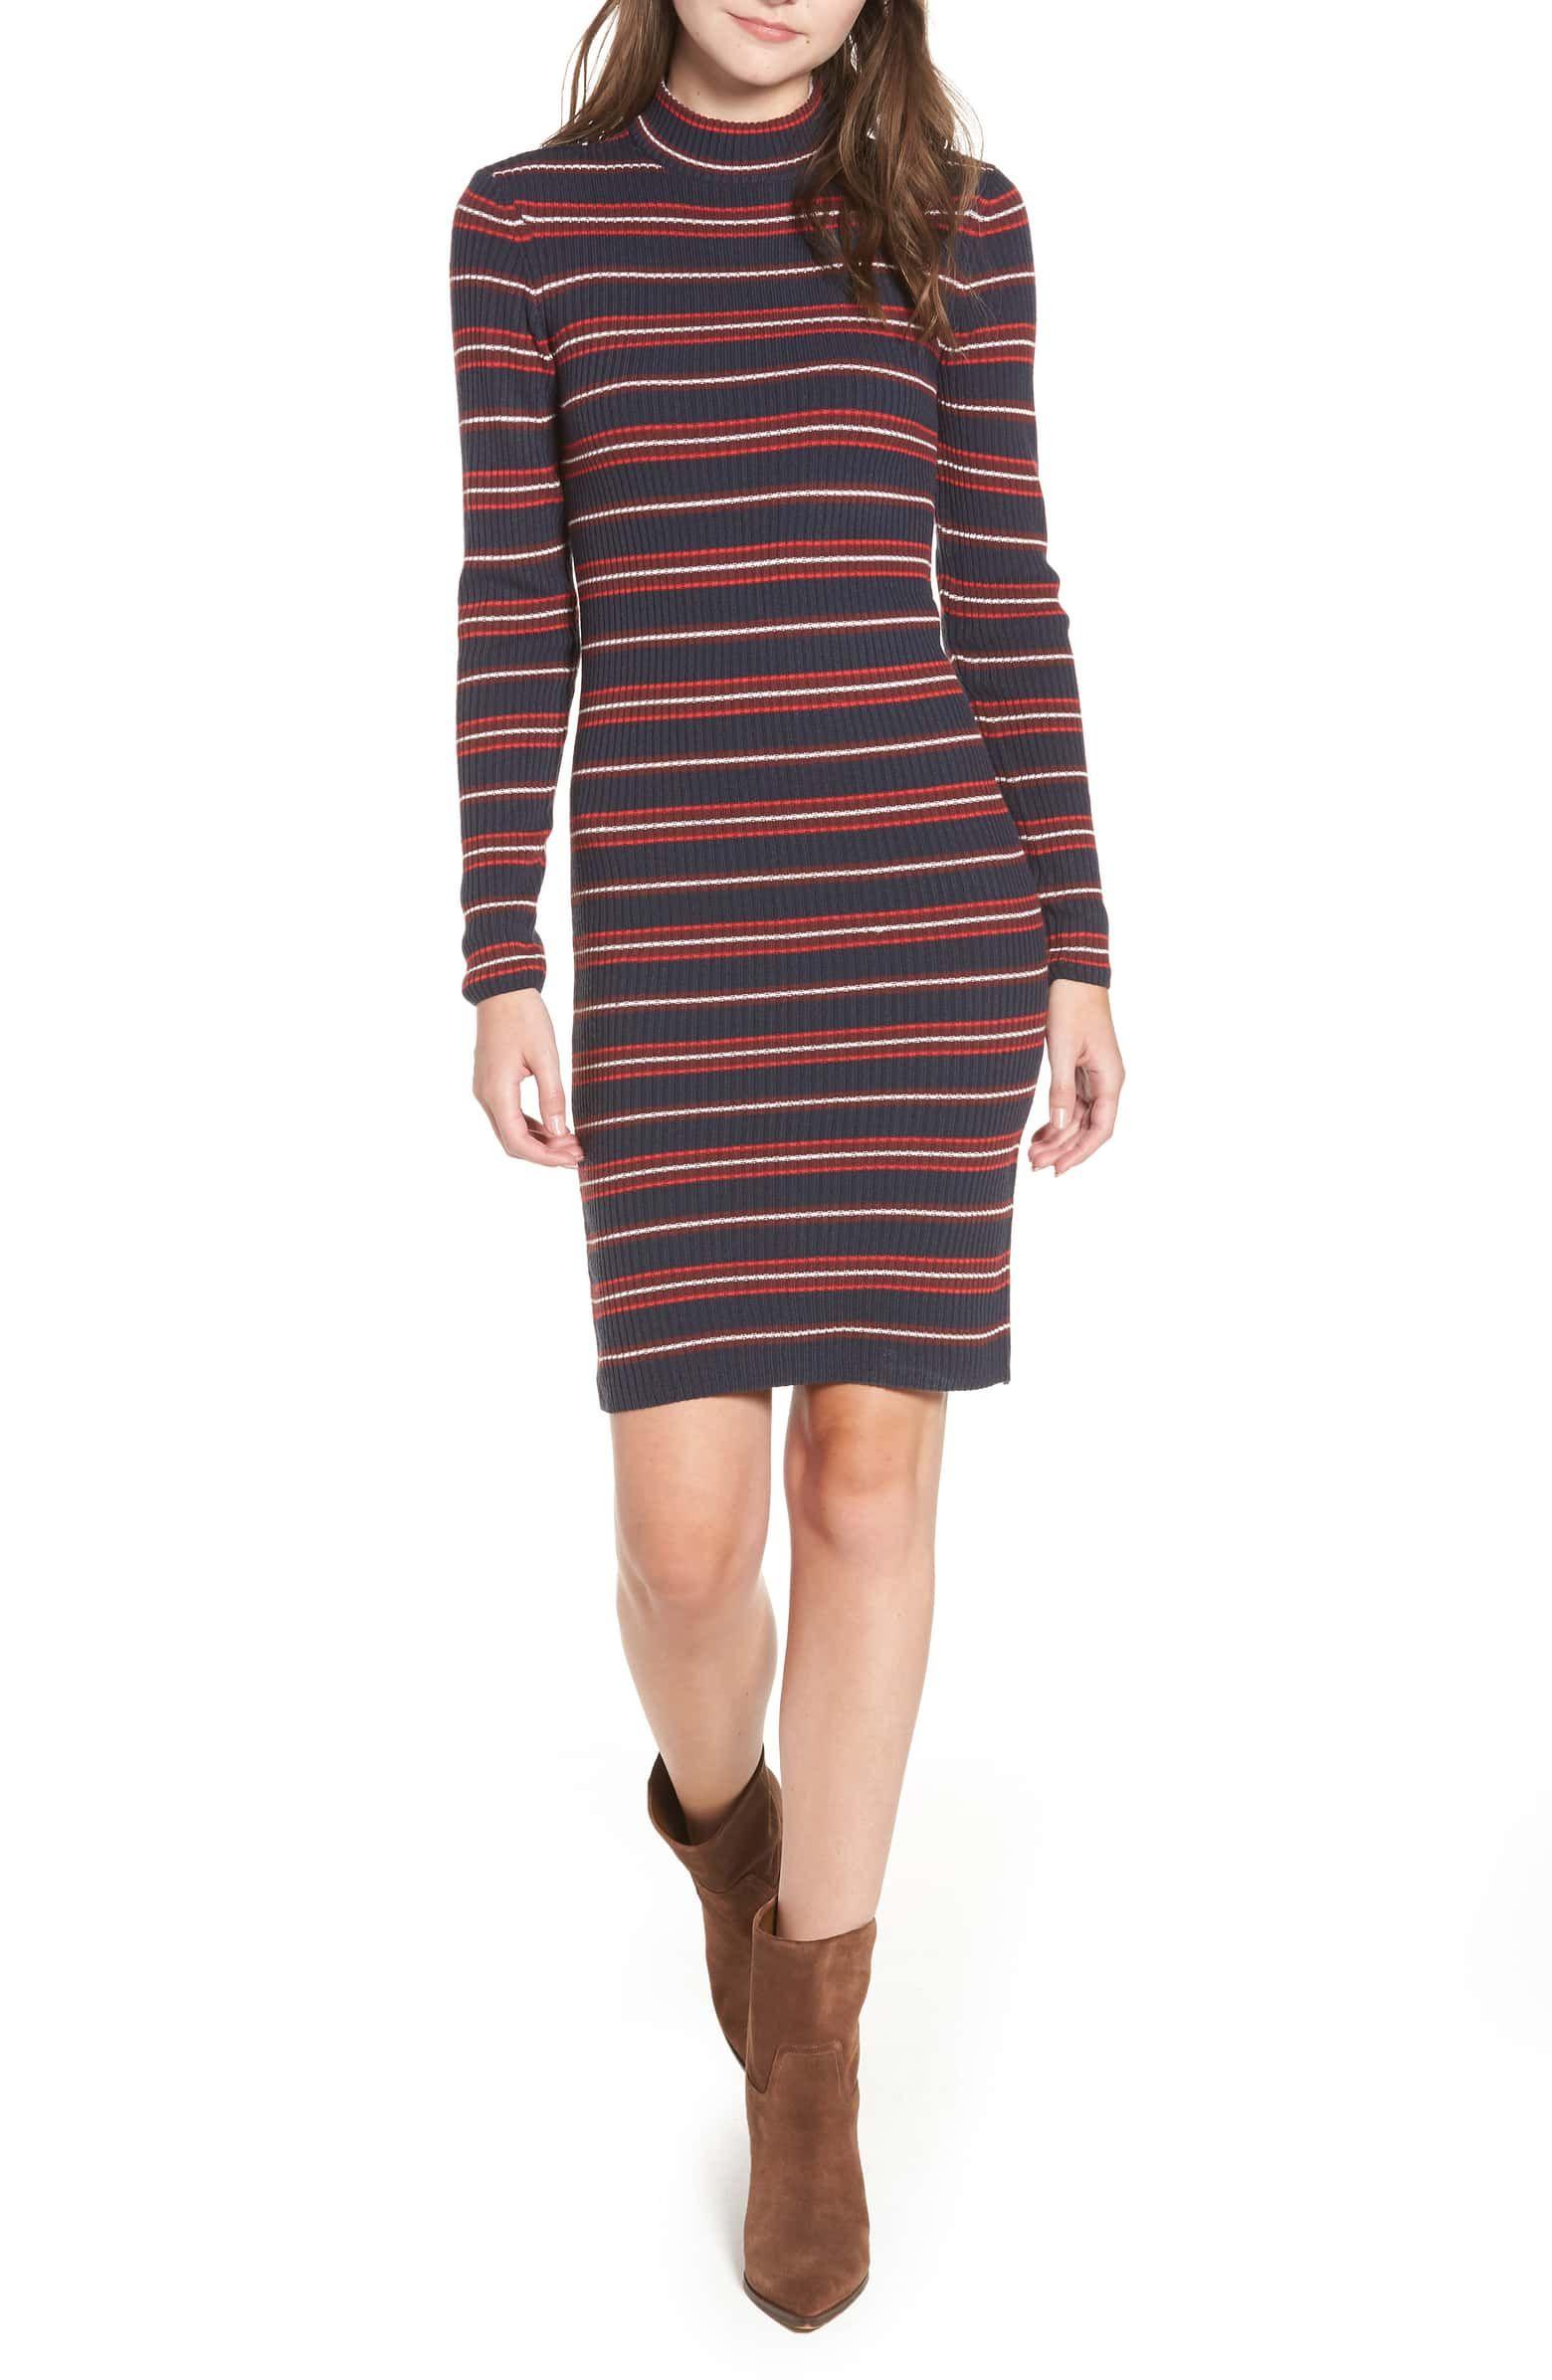 8bde1d7bb39 Myra Stripe Rib Sweater Dress